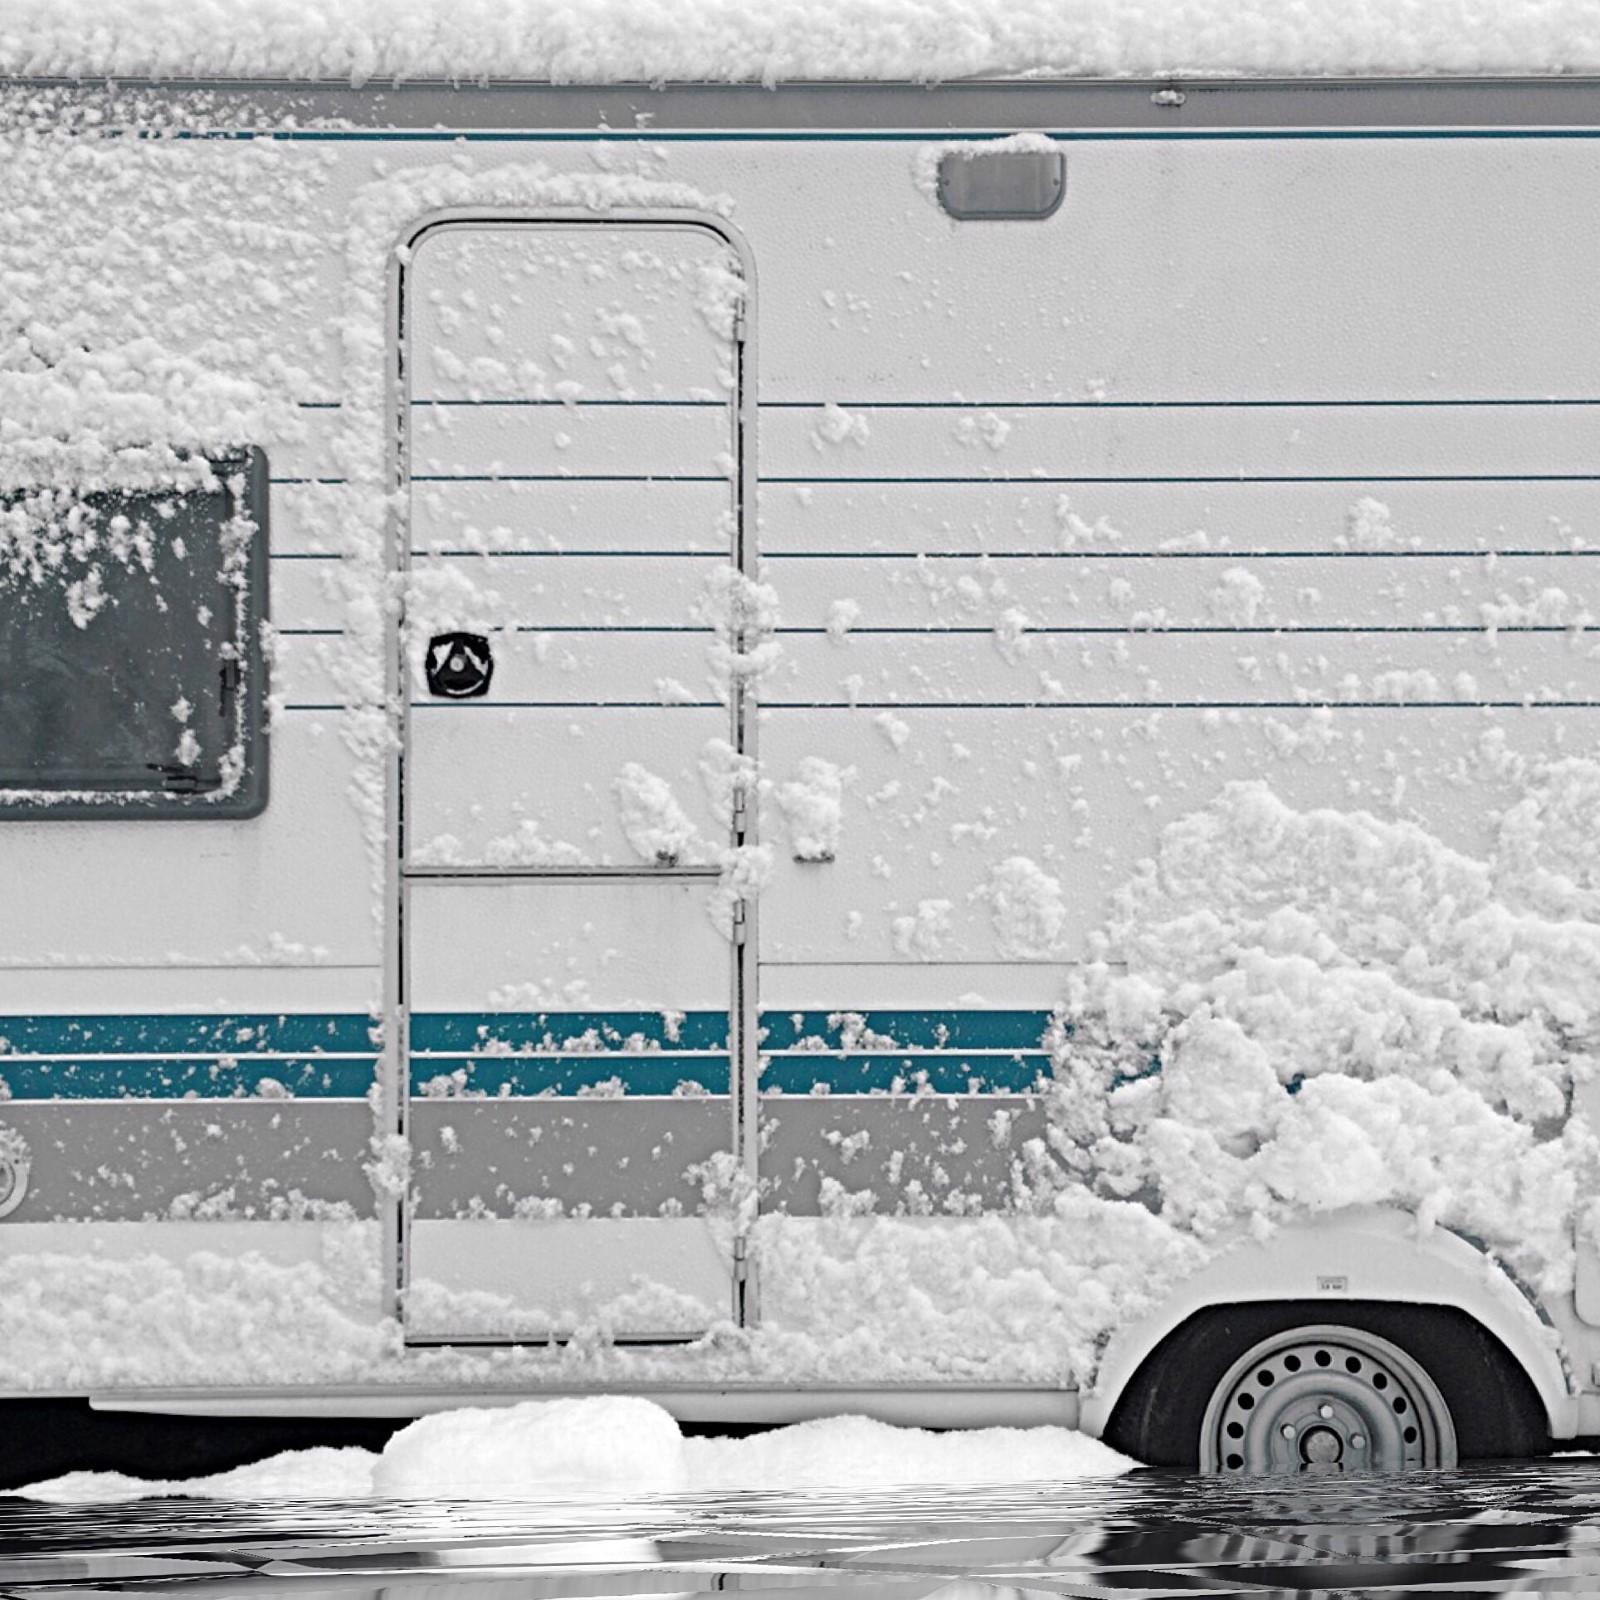 Disavventure Invernali